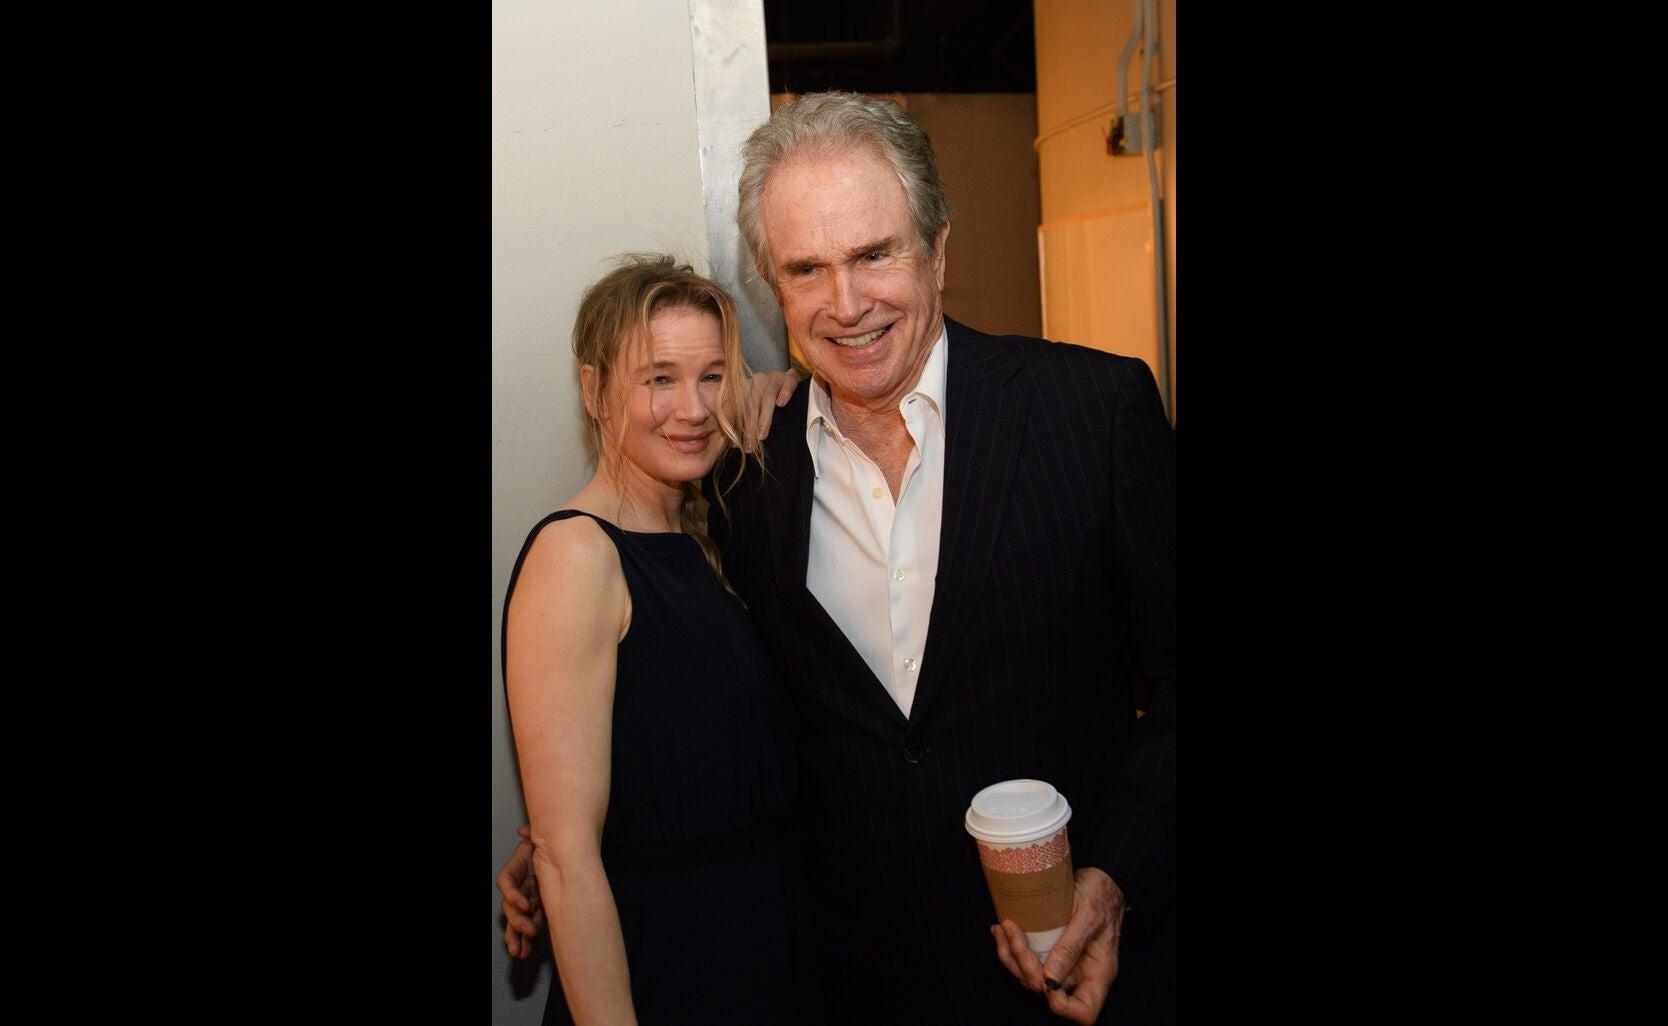 Renee Zelwegger and Warren Beatty at the Annual Grants Banquet 2016